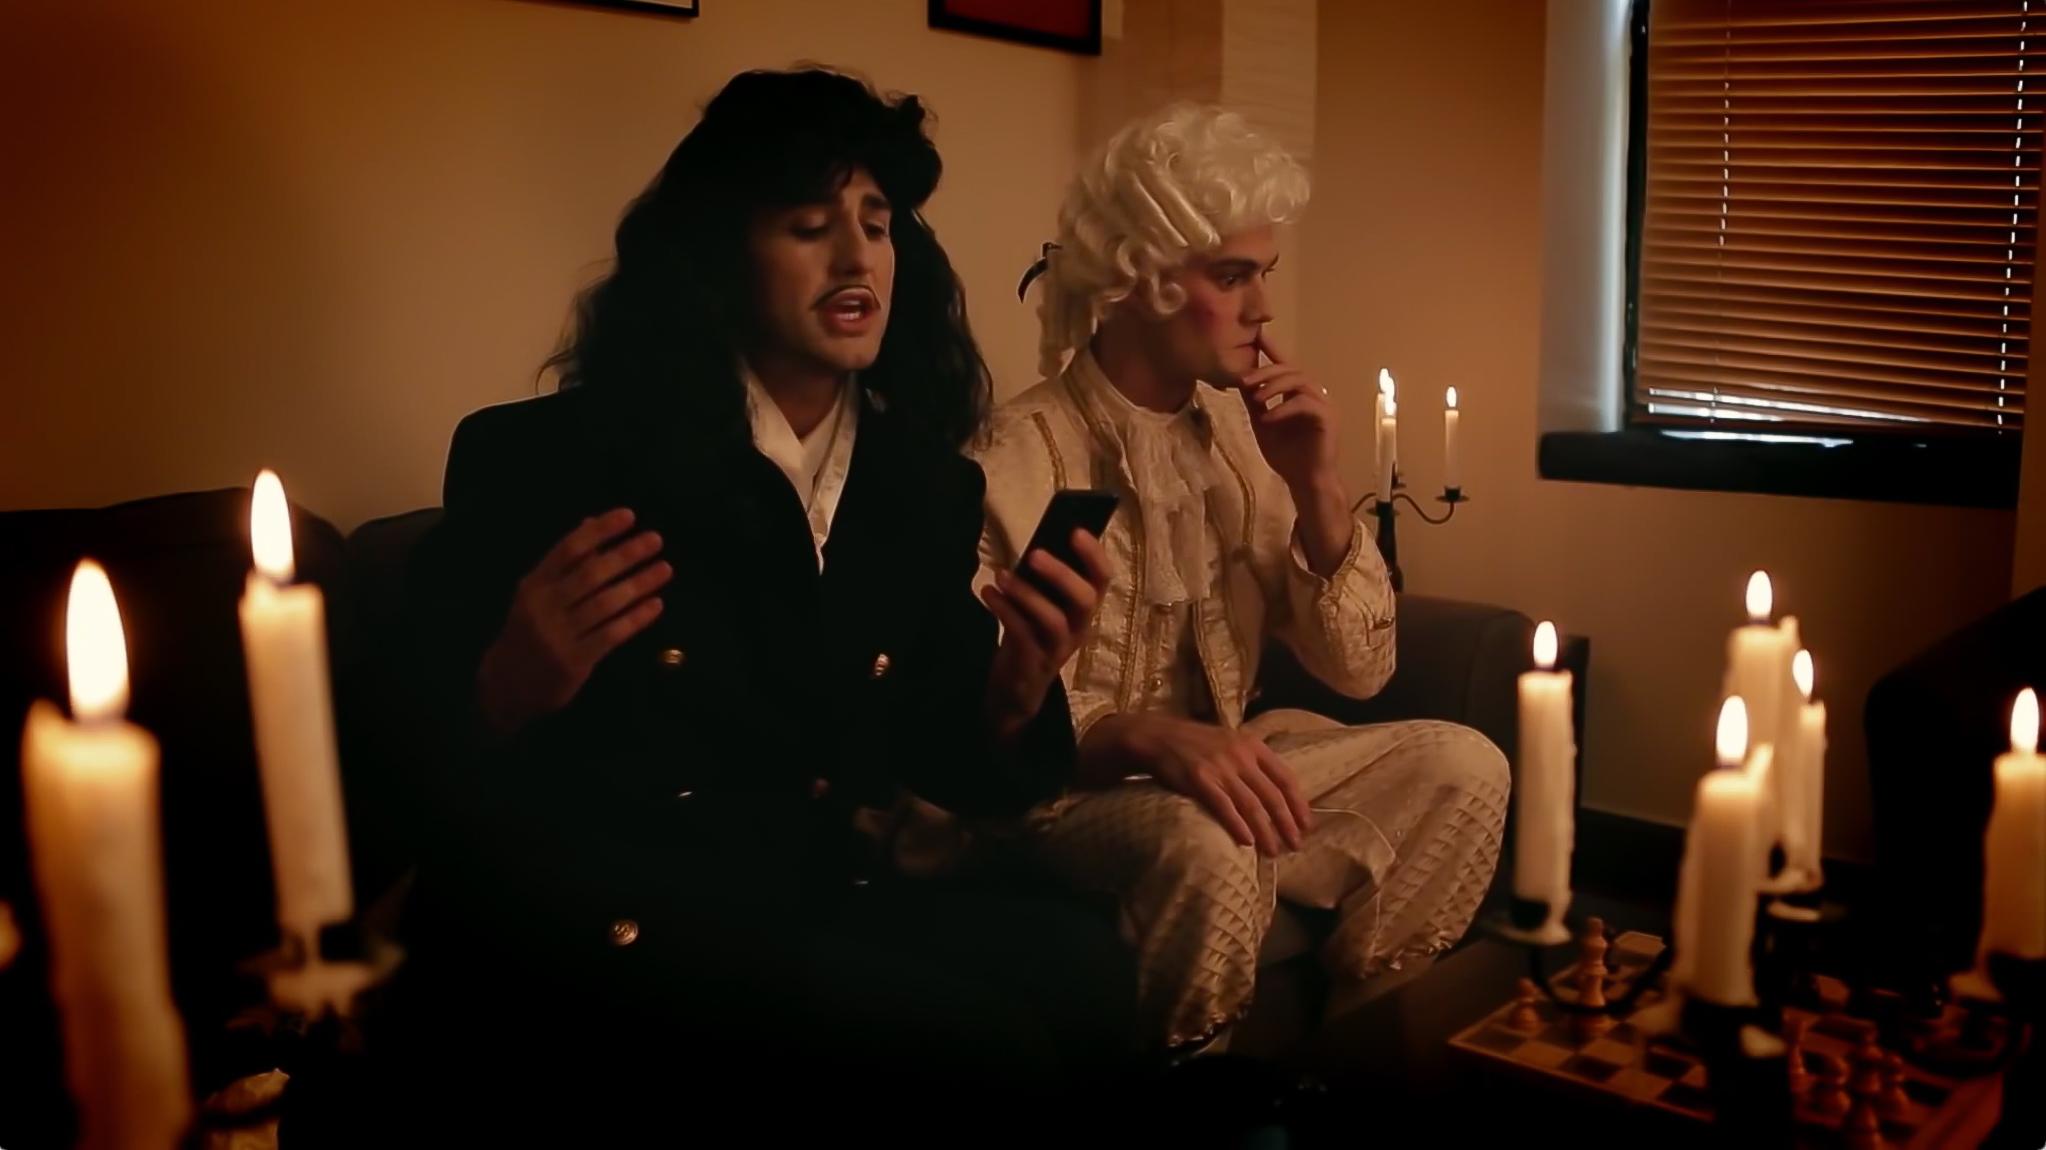 FUTURE HUSBANDS (Original Series for BOAT)